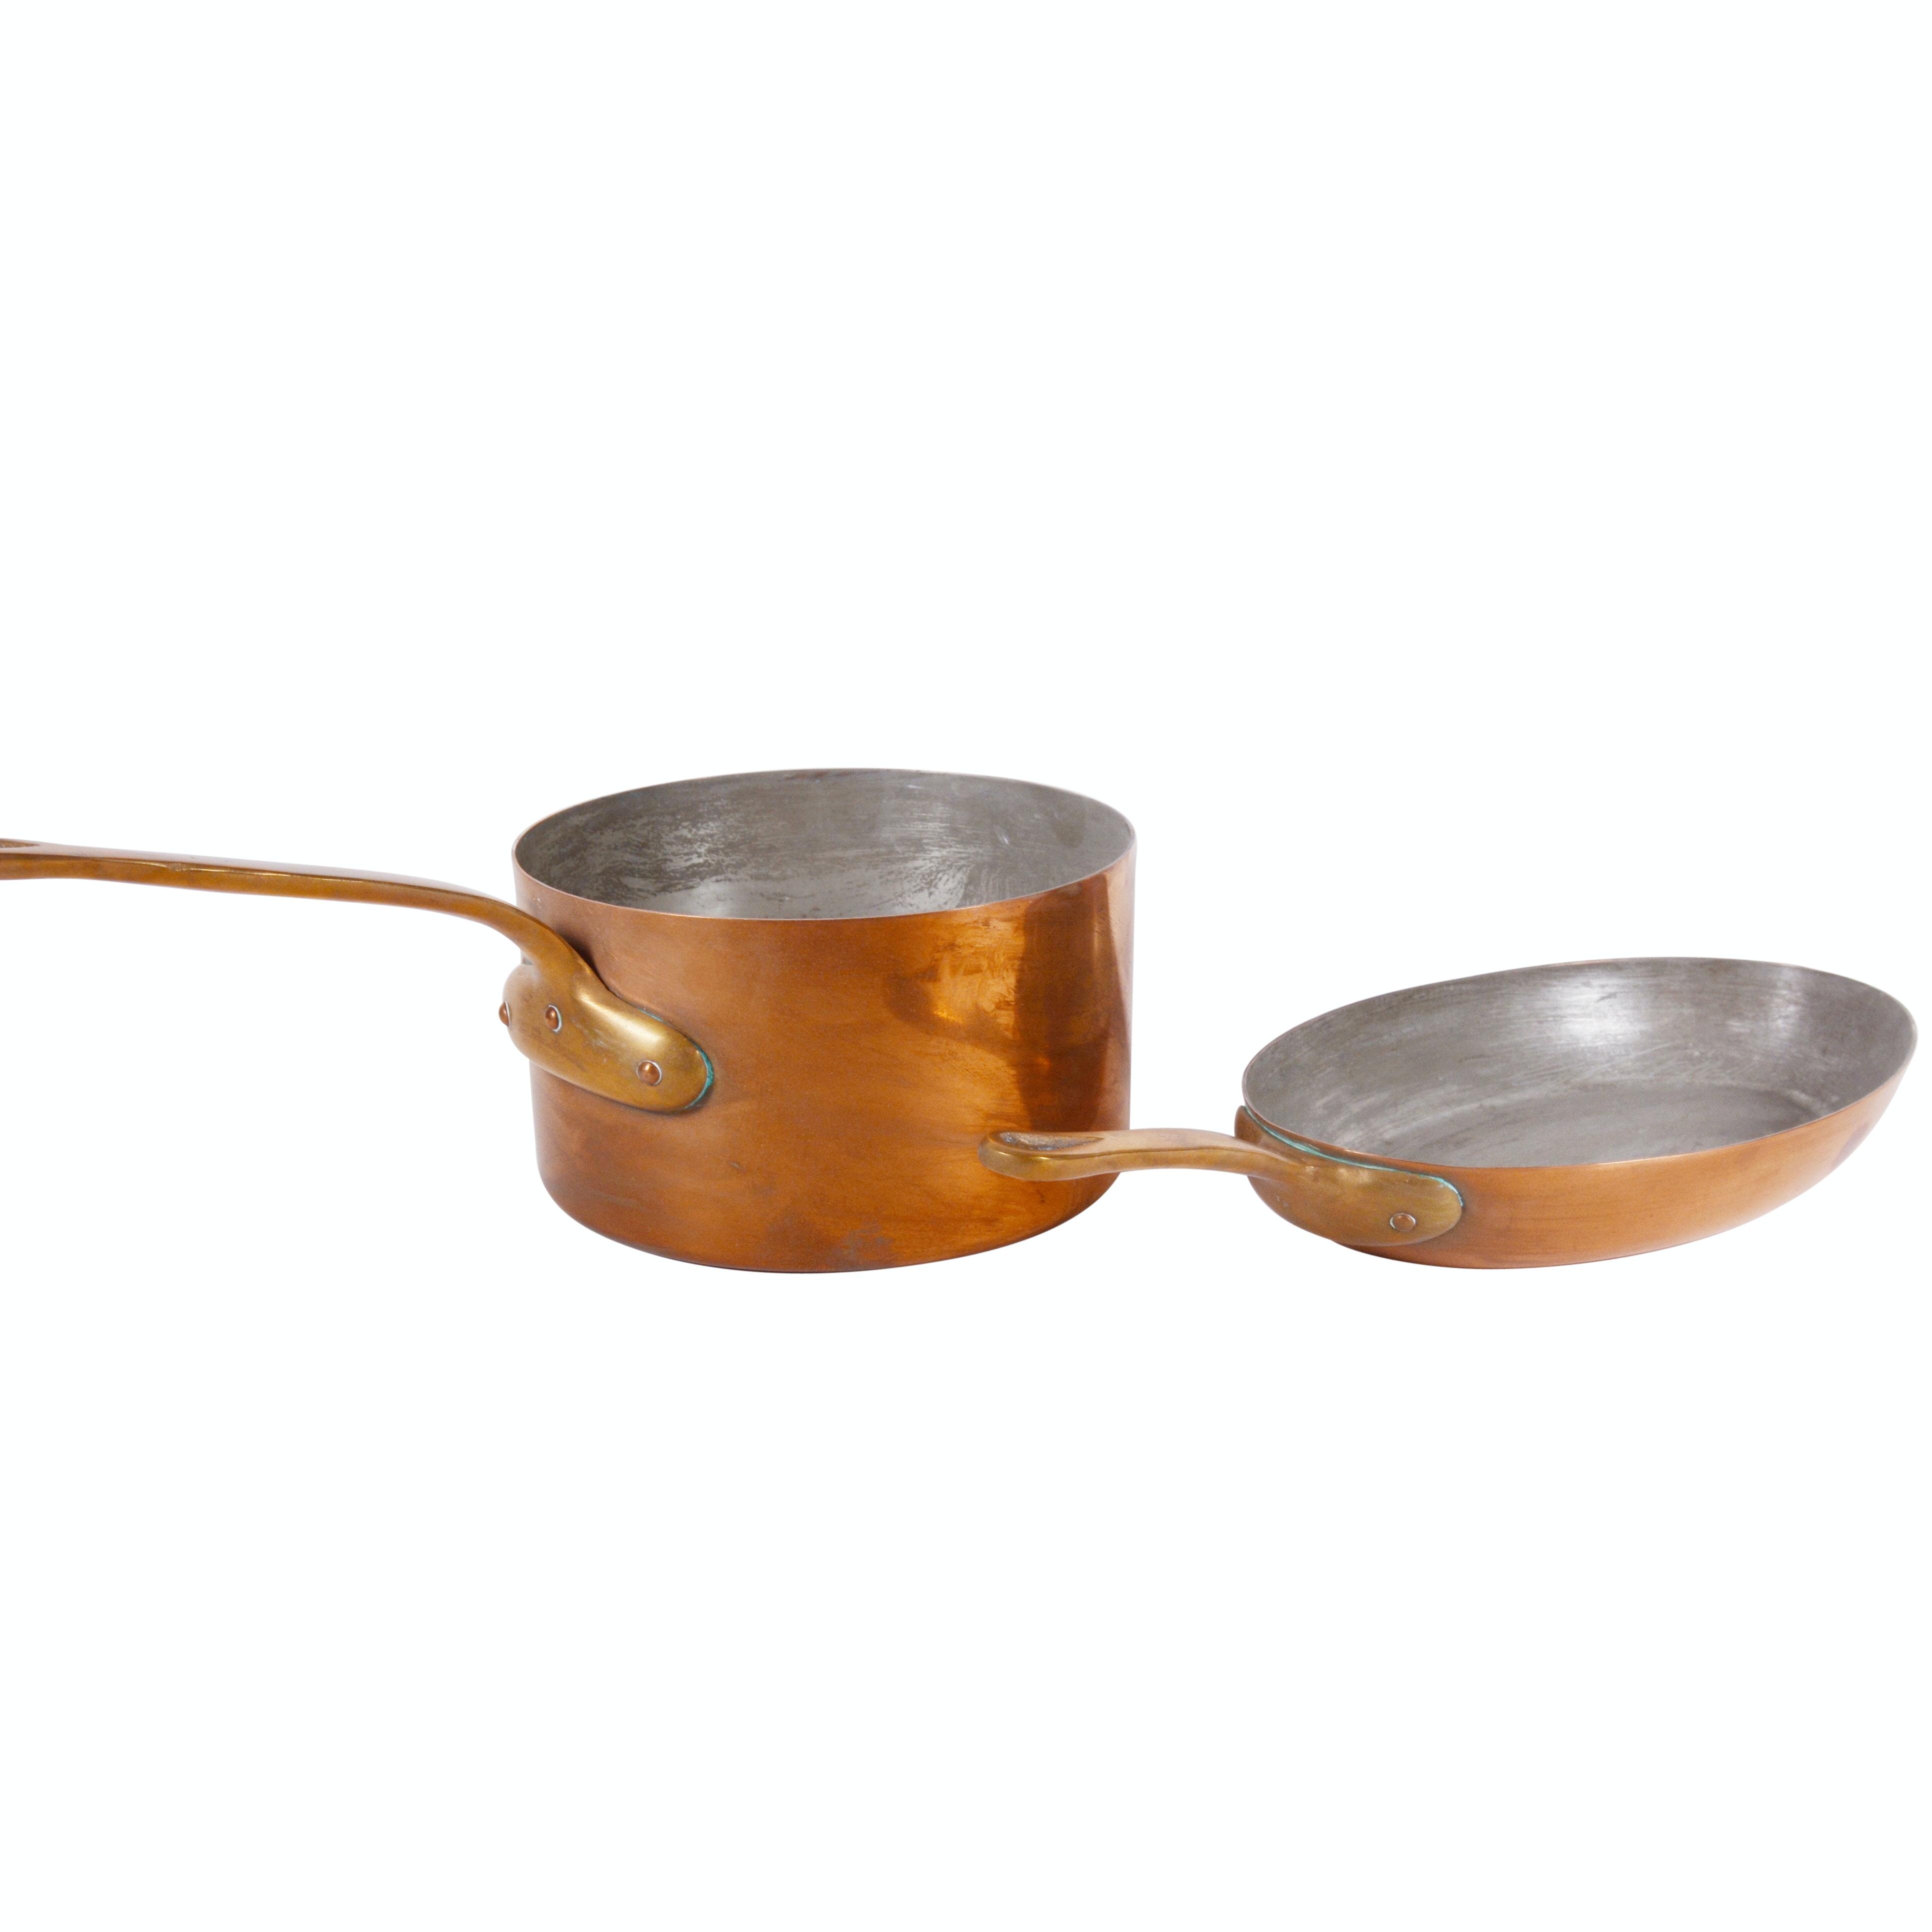 Bazar Francais Copper Sauce Pan and Oval Saute Pan